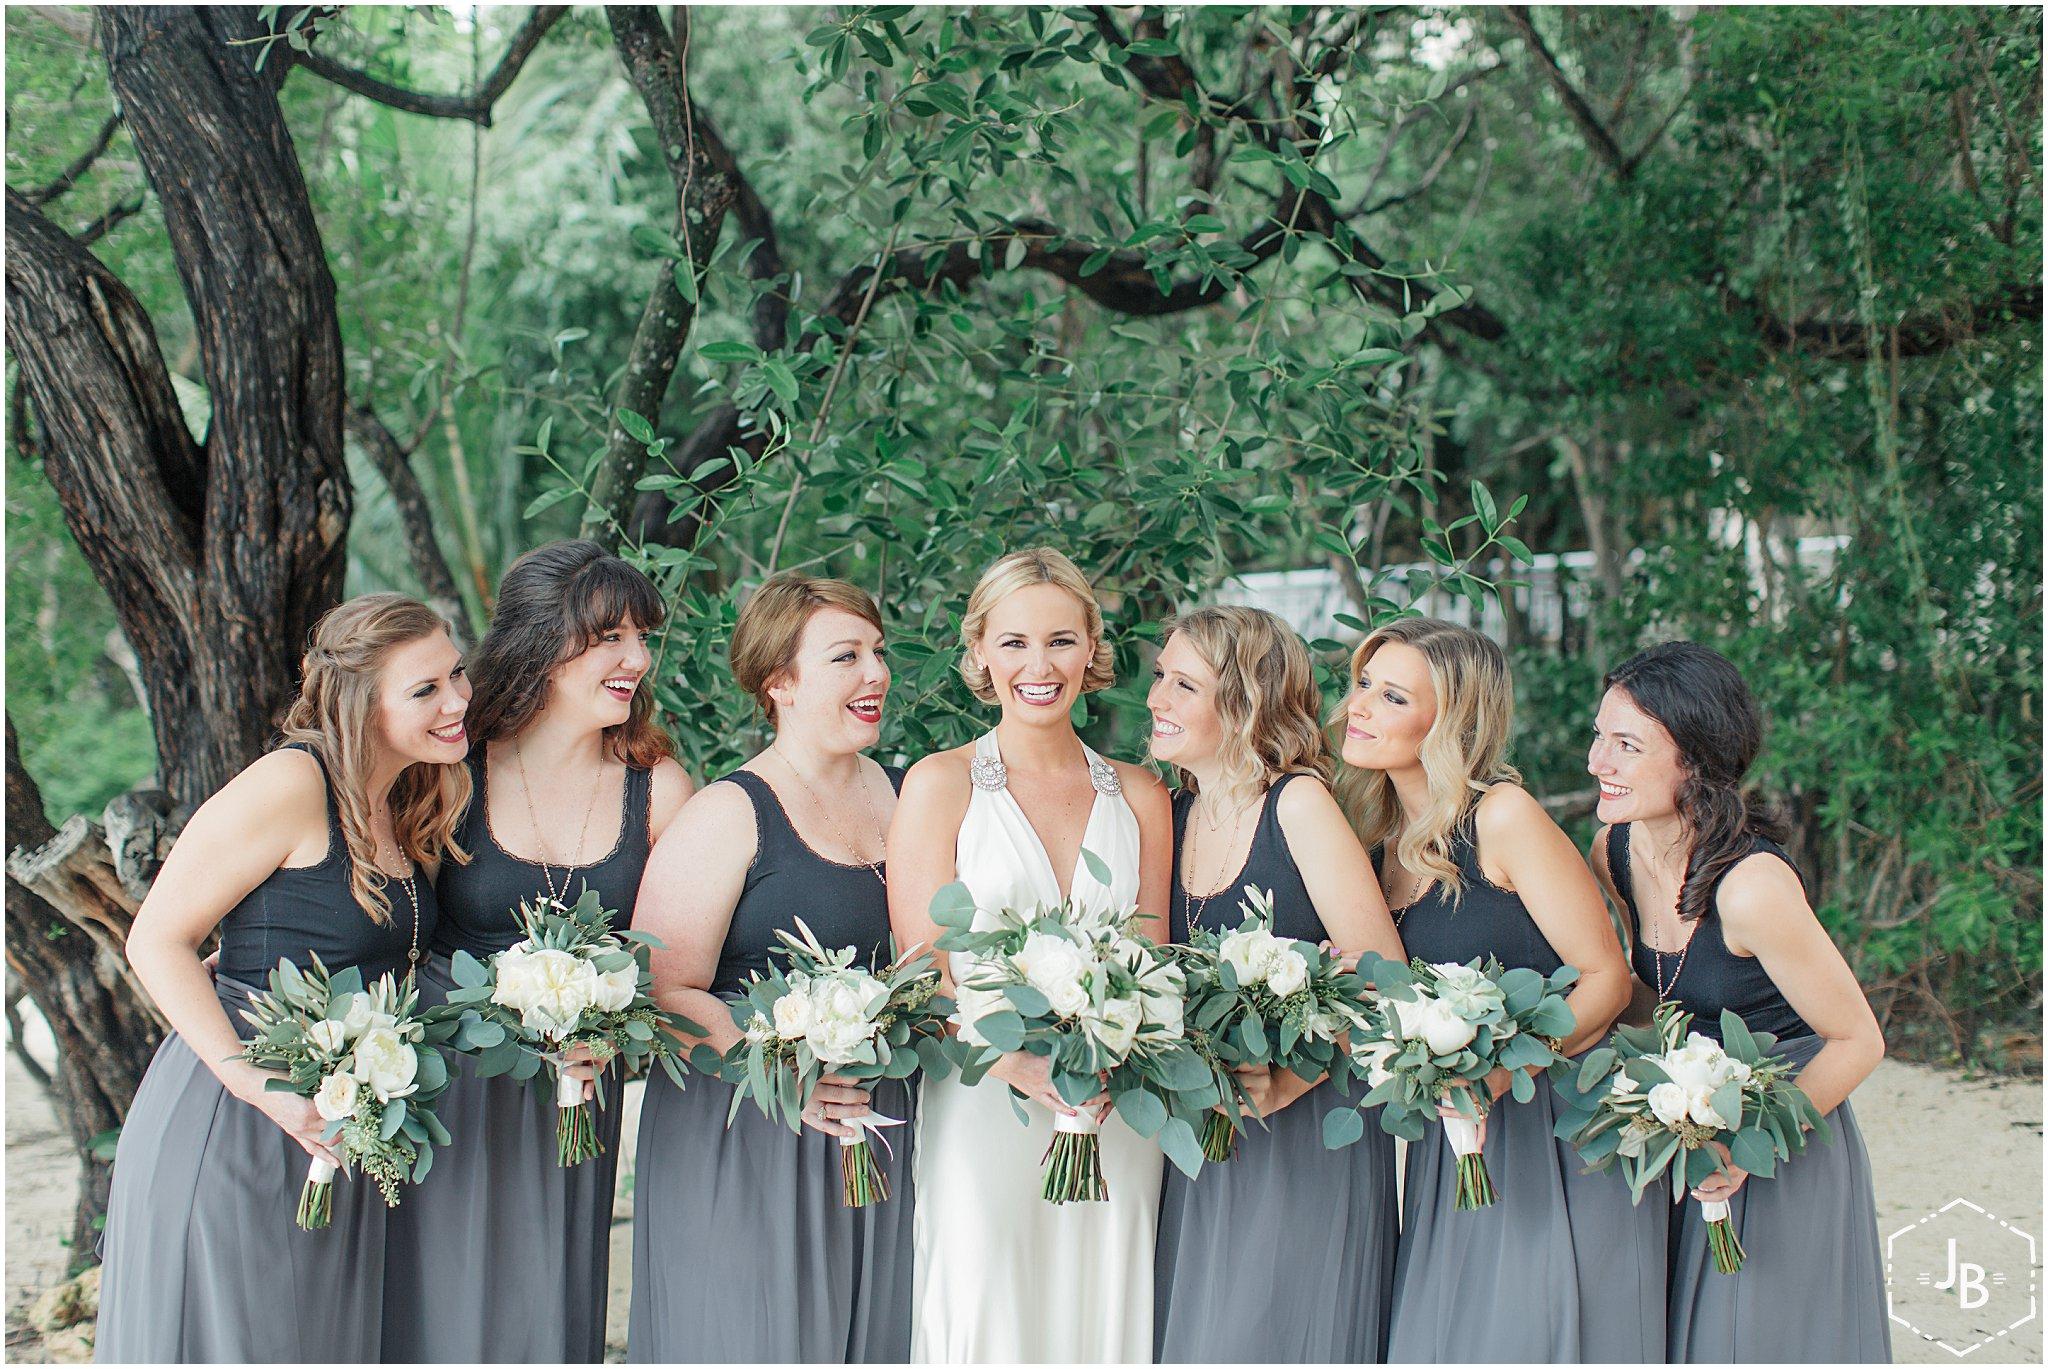 WeddingandEngagementFloridaPhotographer_1101.jpg